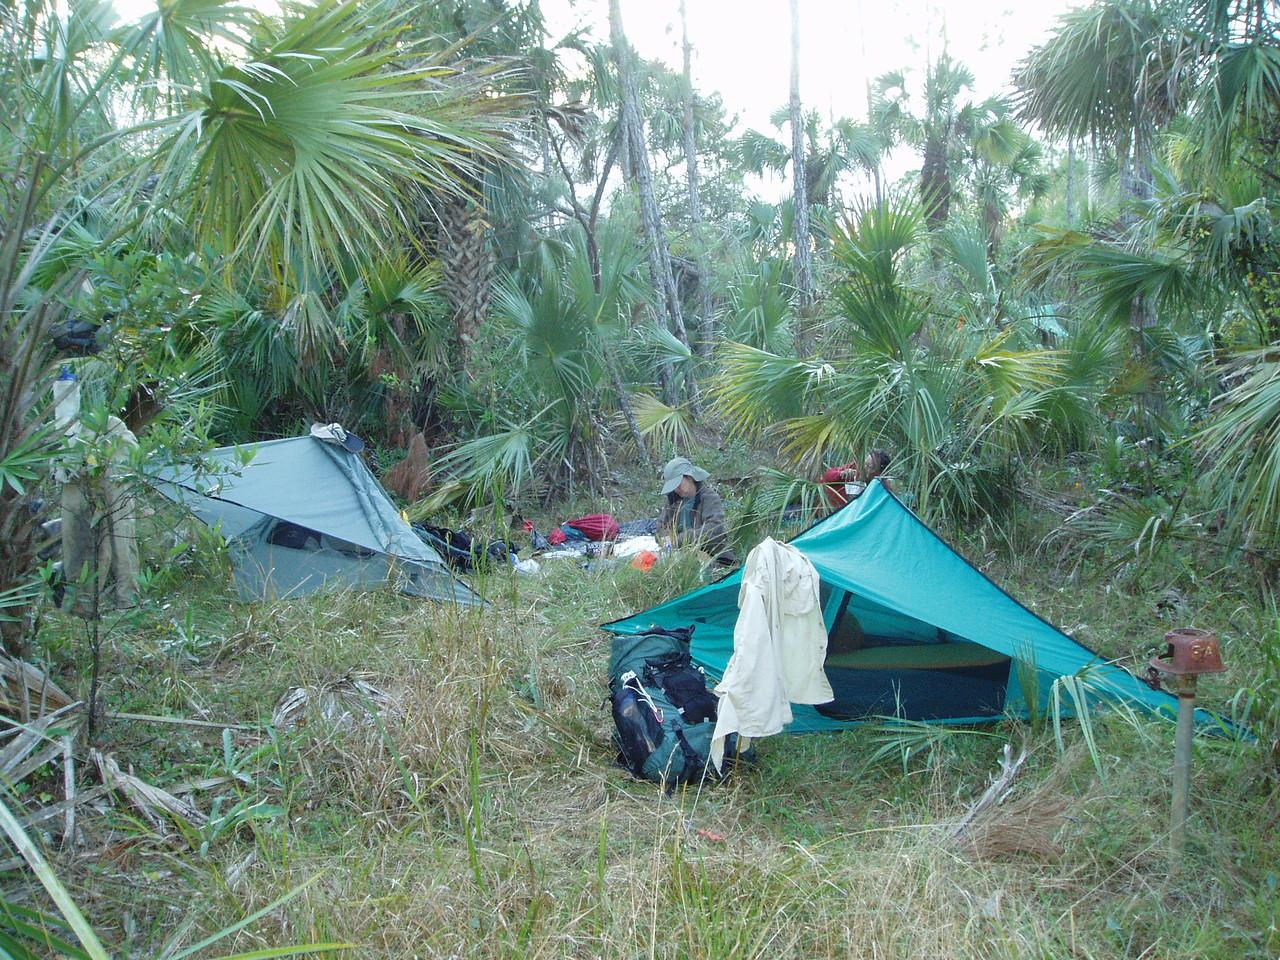 Setting up camp<br /> PHOTO CREDIT: Robert Coveney / Florida Trail Association